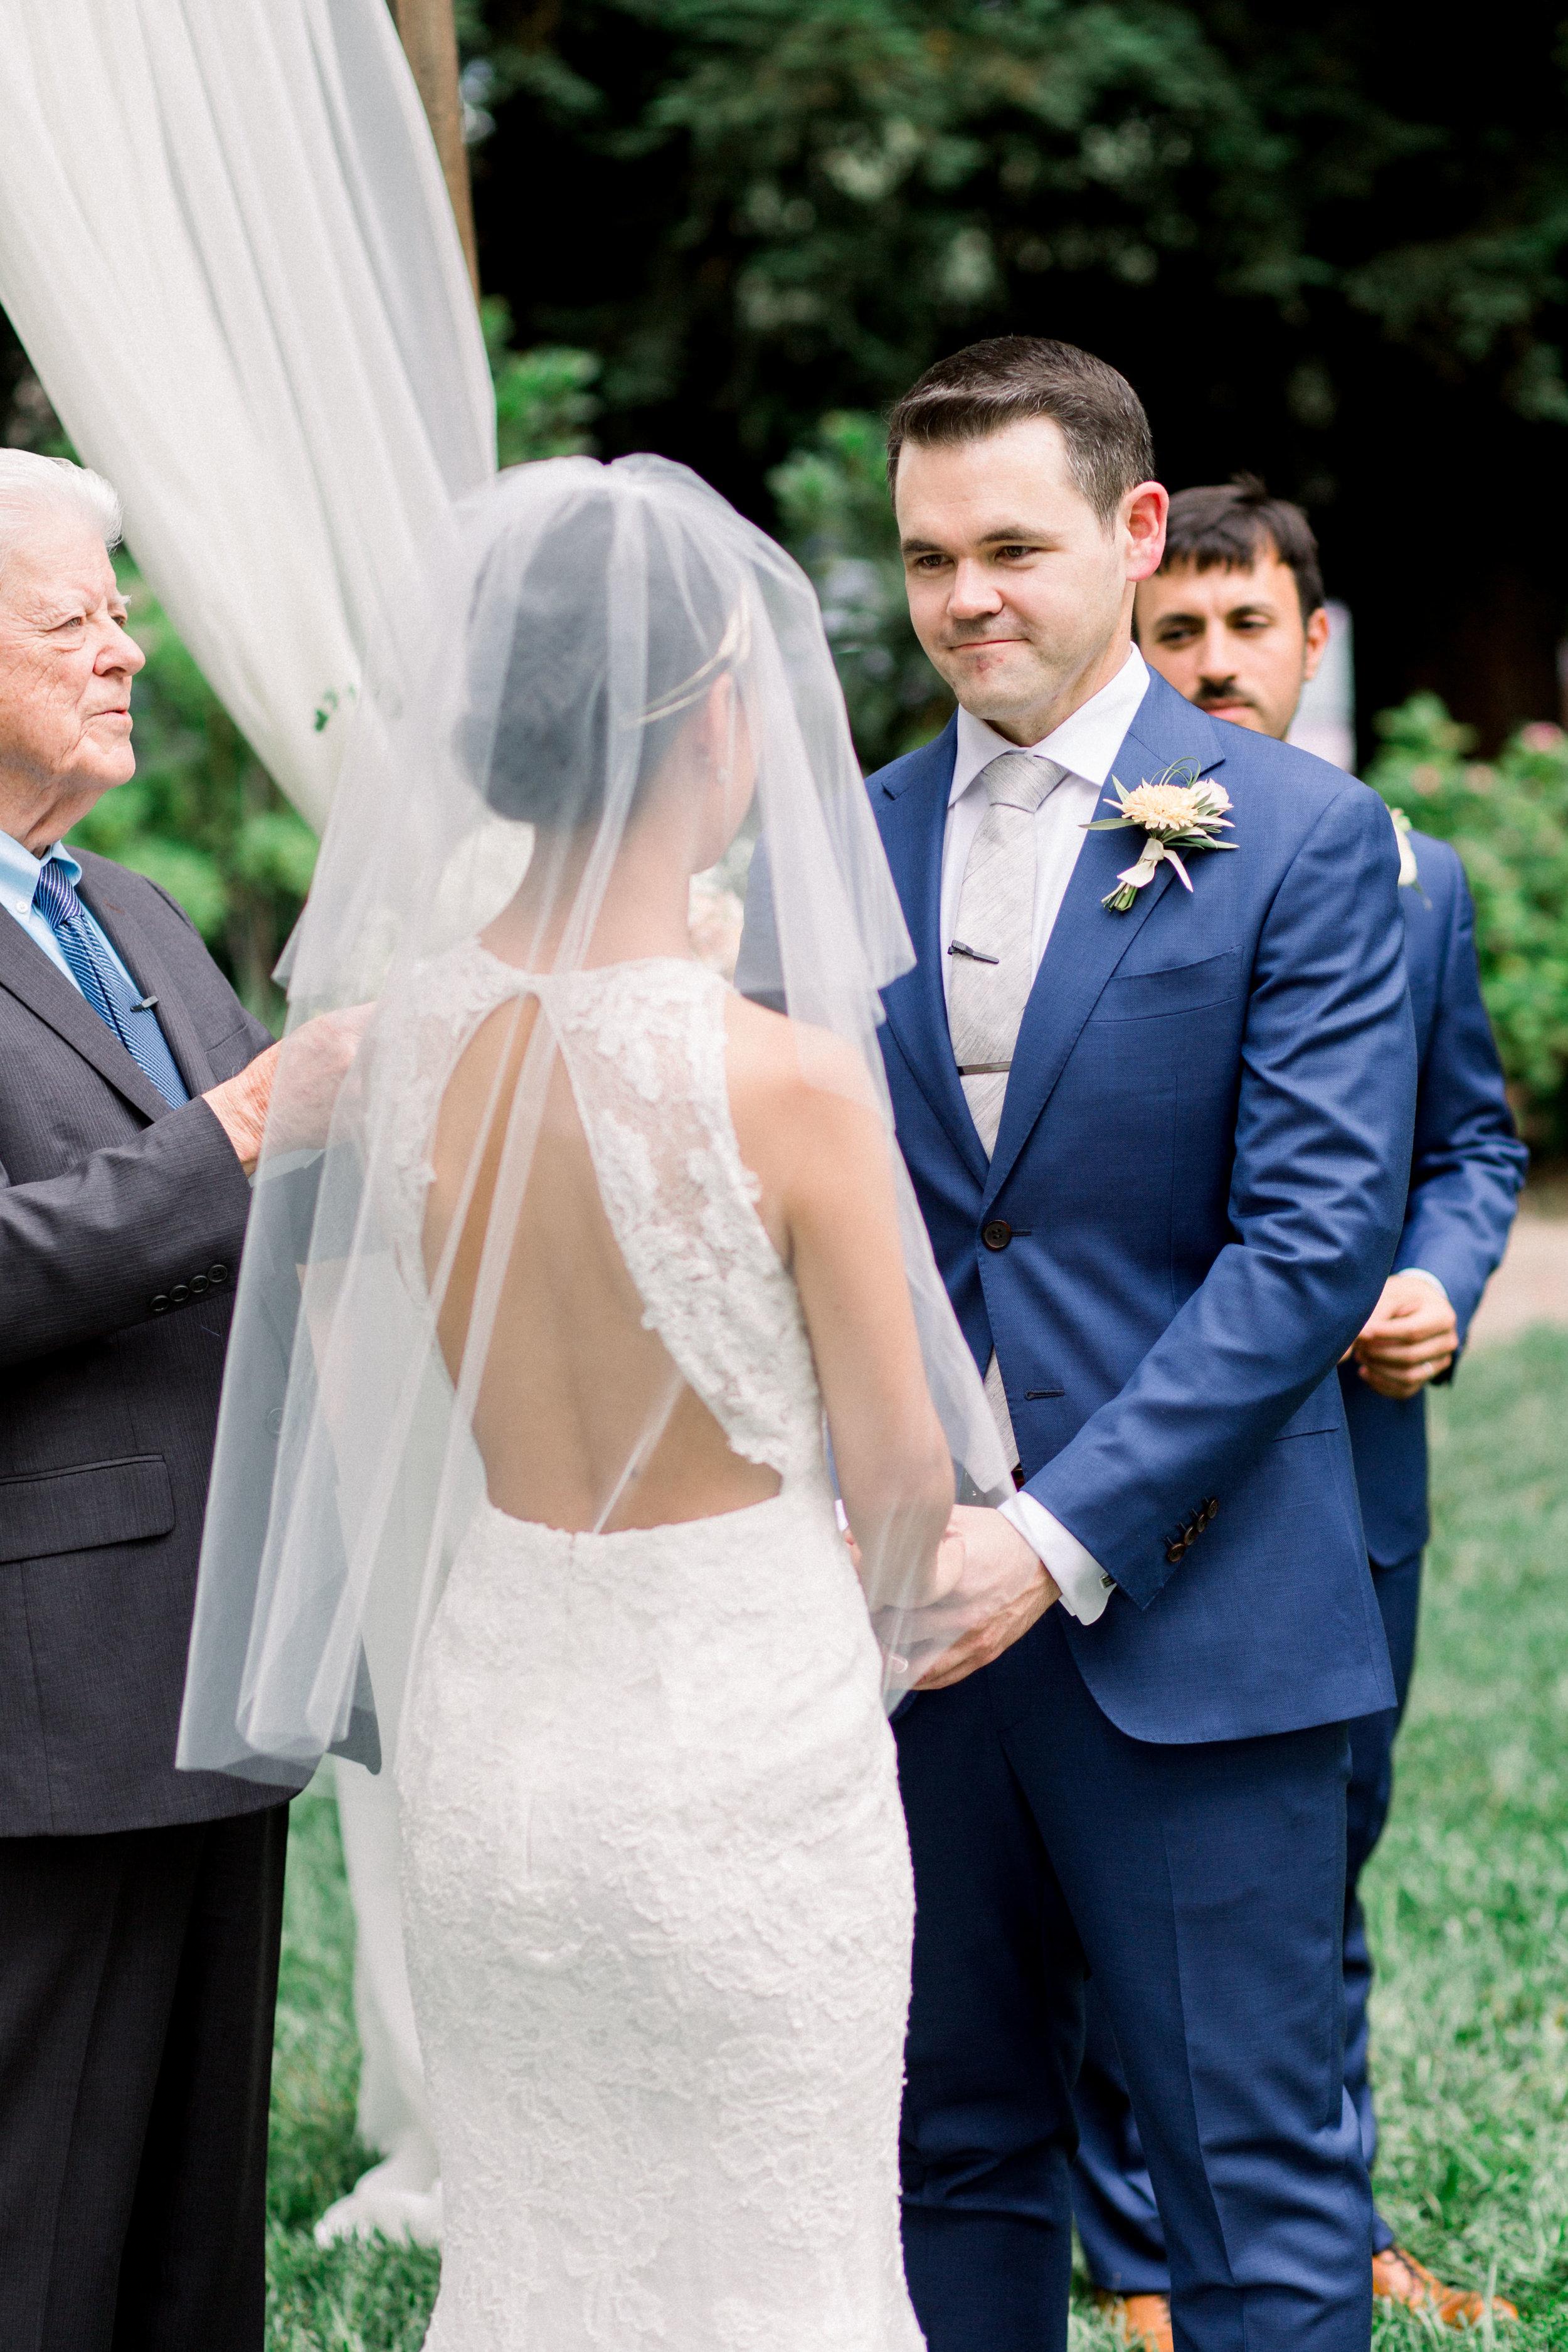 Harvest-inn-wedding-in-napa-california-310.jpg